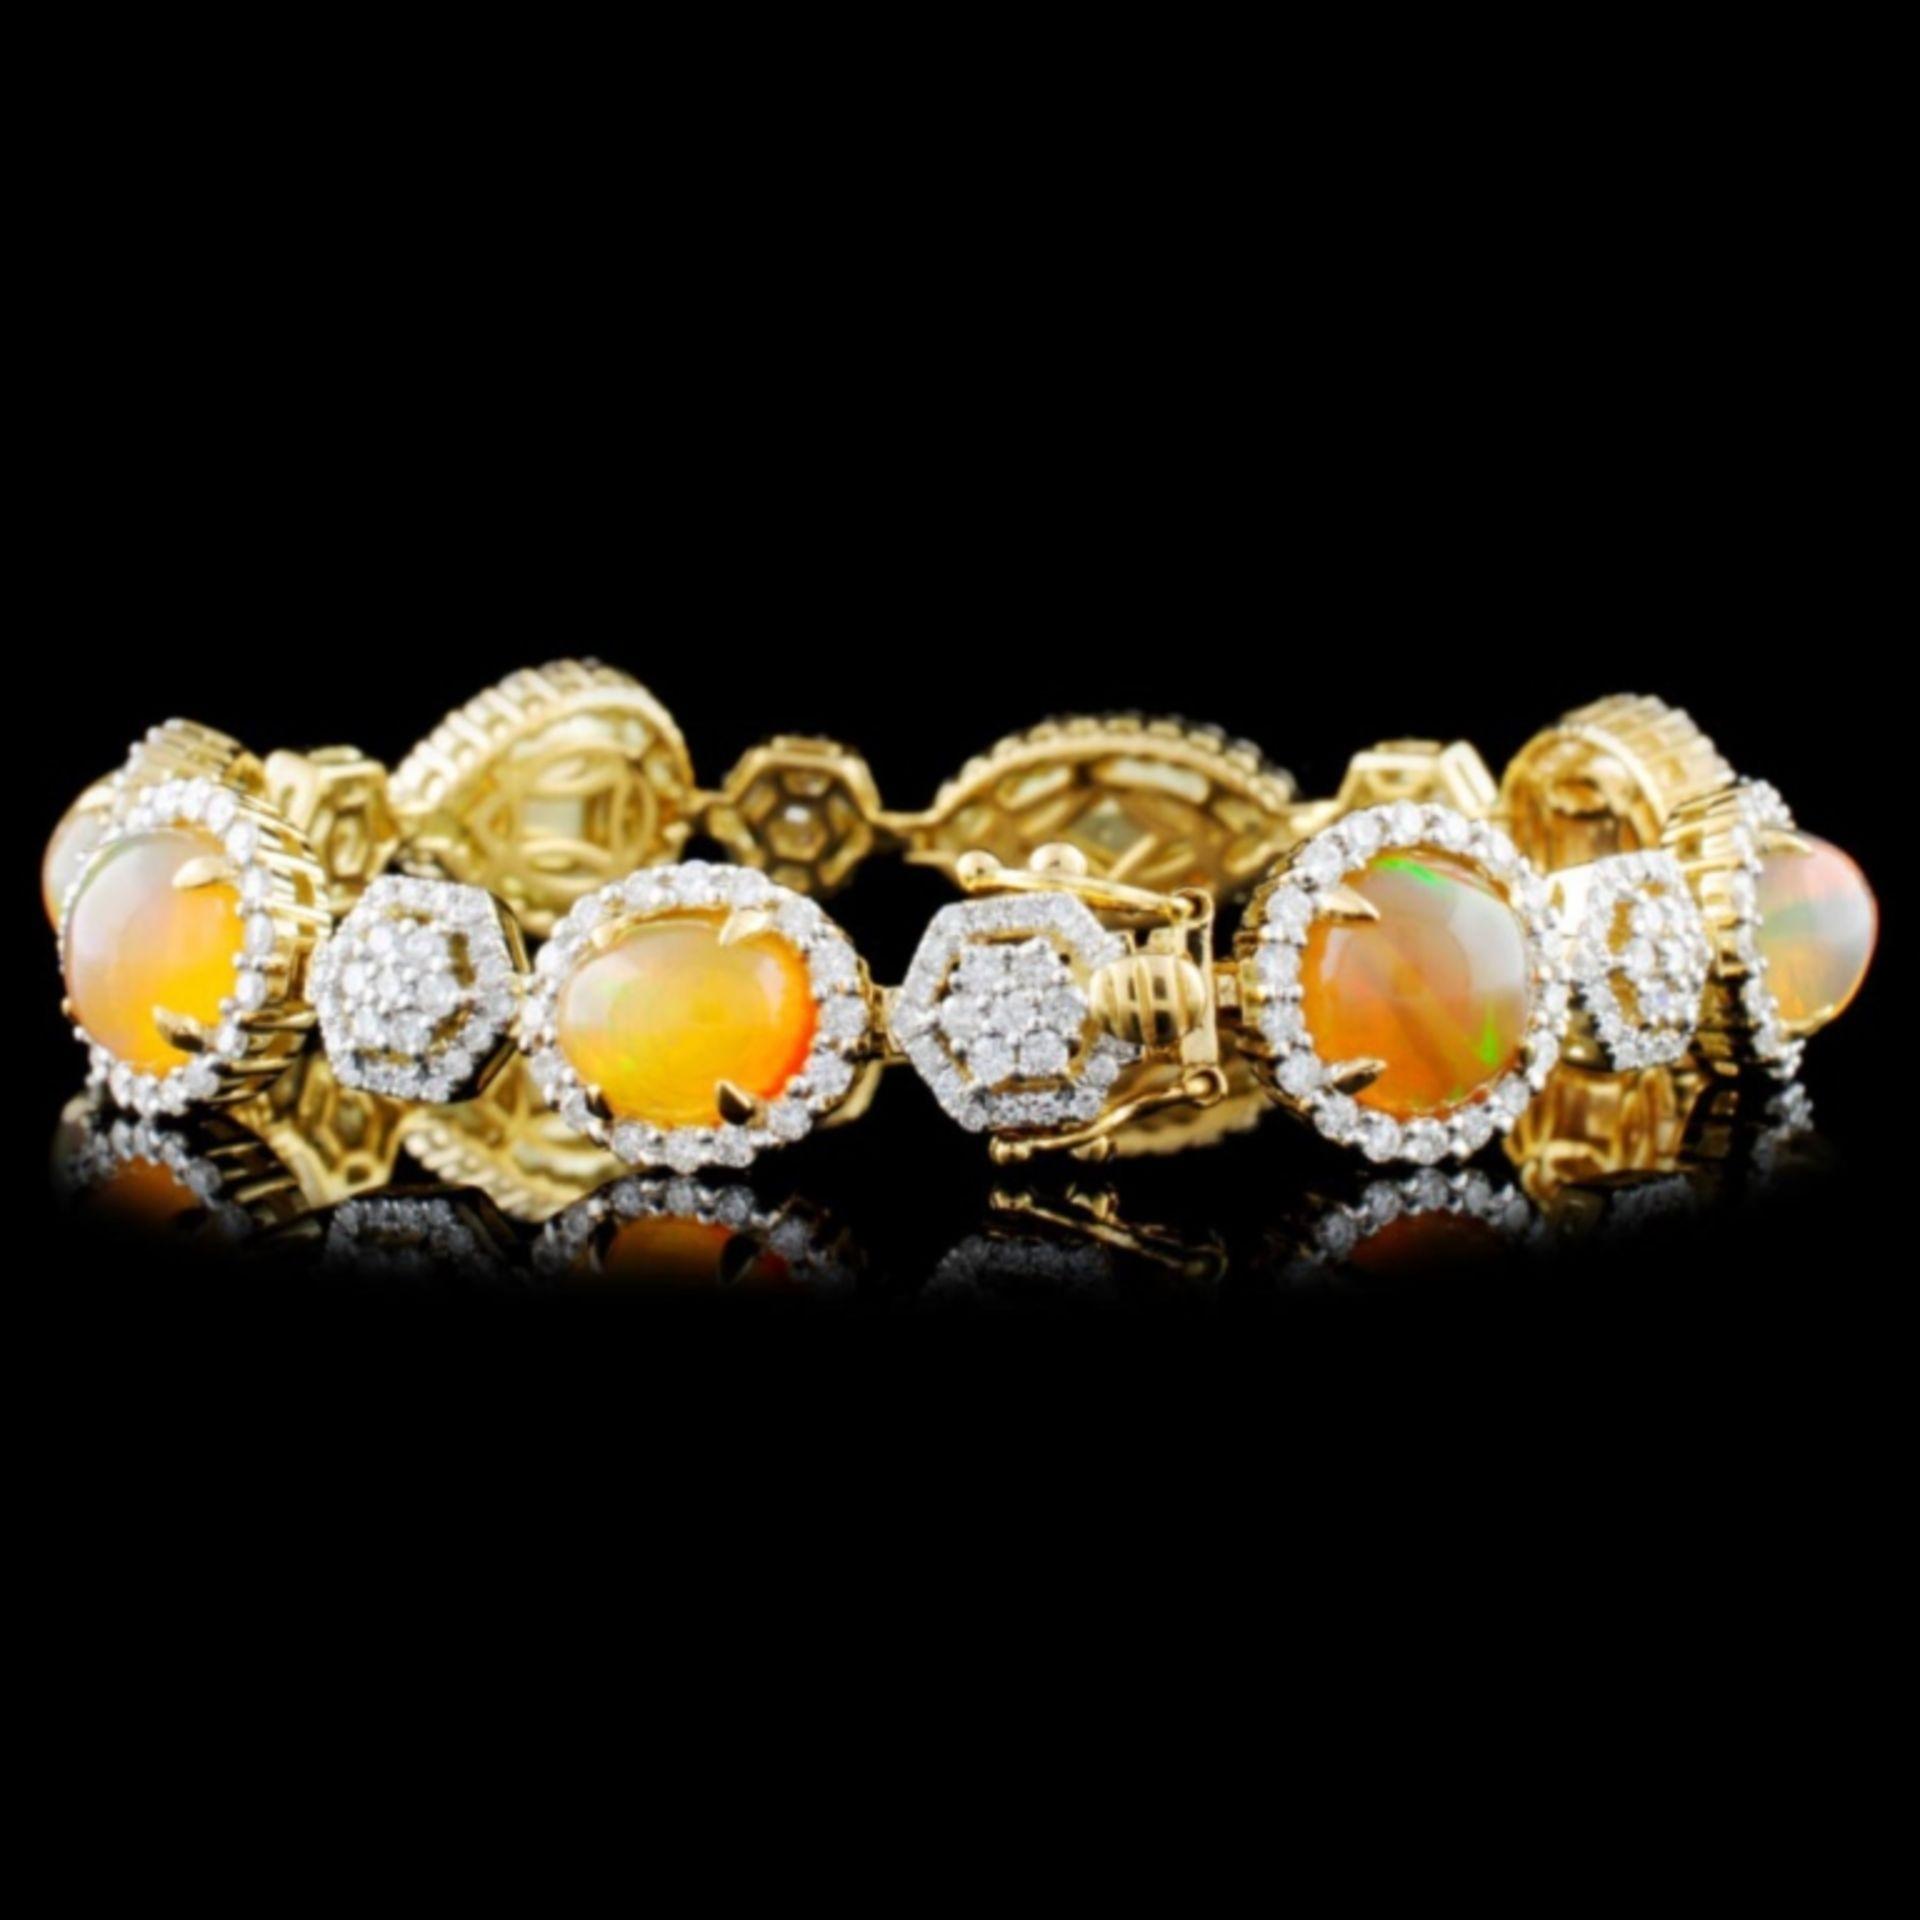 14K Gold 12.08ctw Opal & 3.08ctw Diamond Bracelet - Image 2 of 3